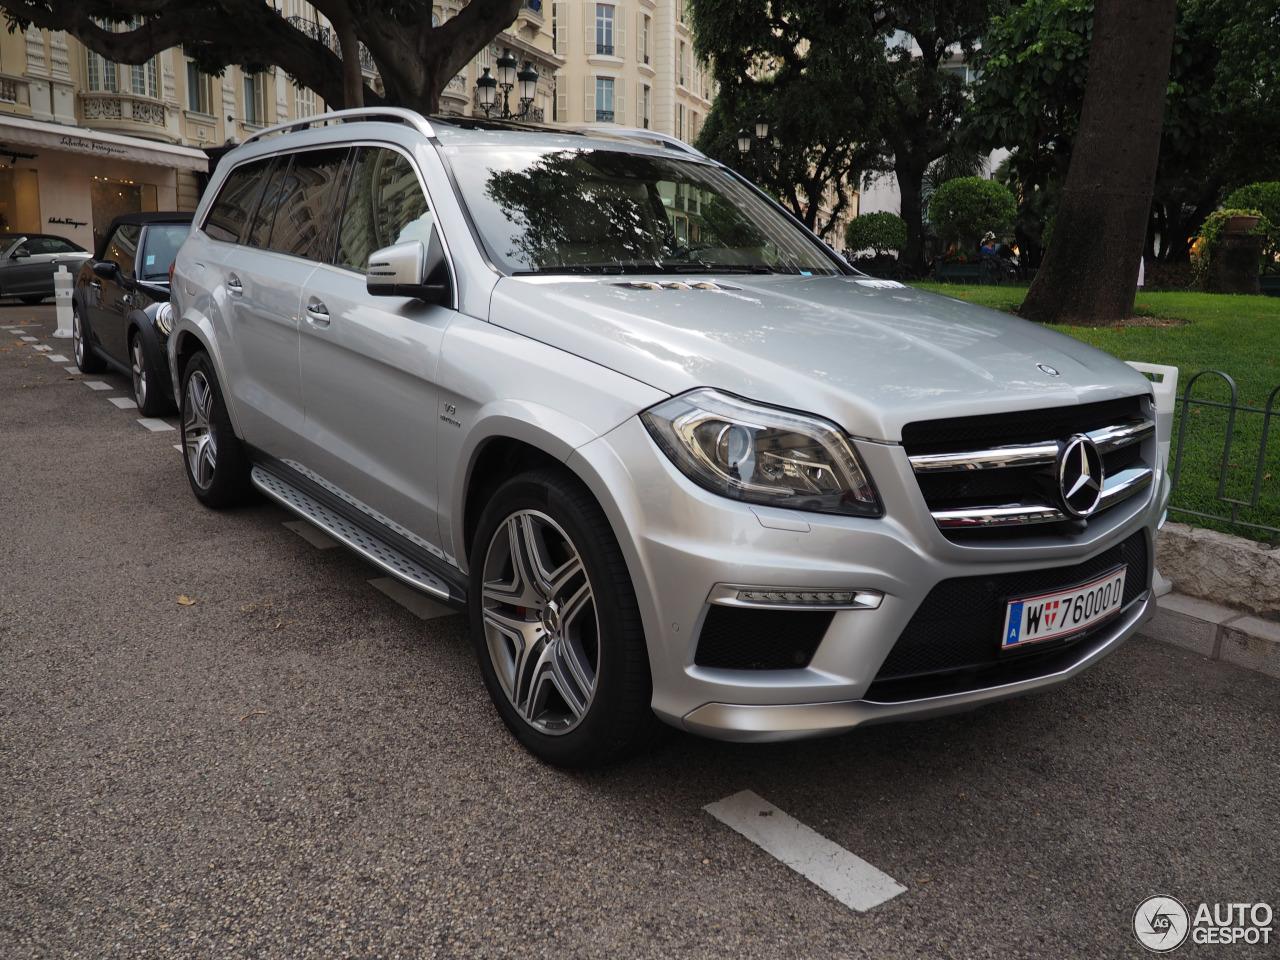 Mercedes benz gl 63 amg x166 26 august 2015 autogespot for Mercedes benz gl amg 2015